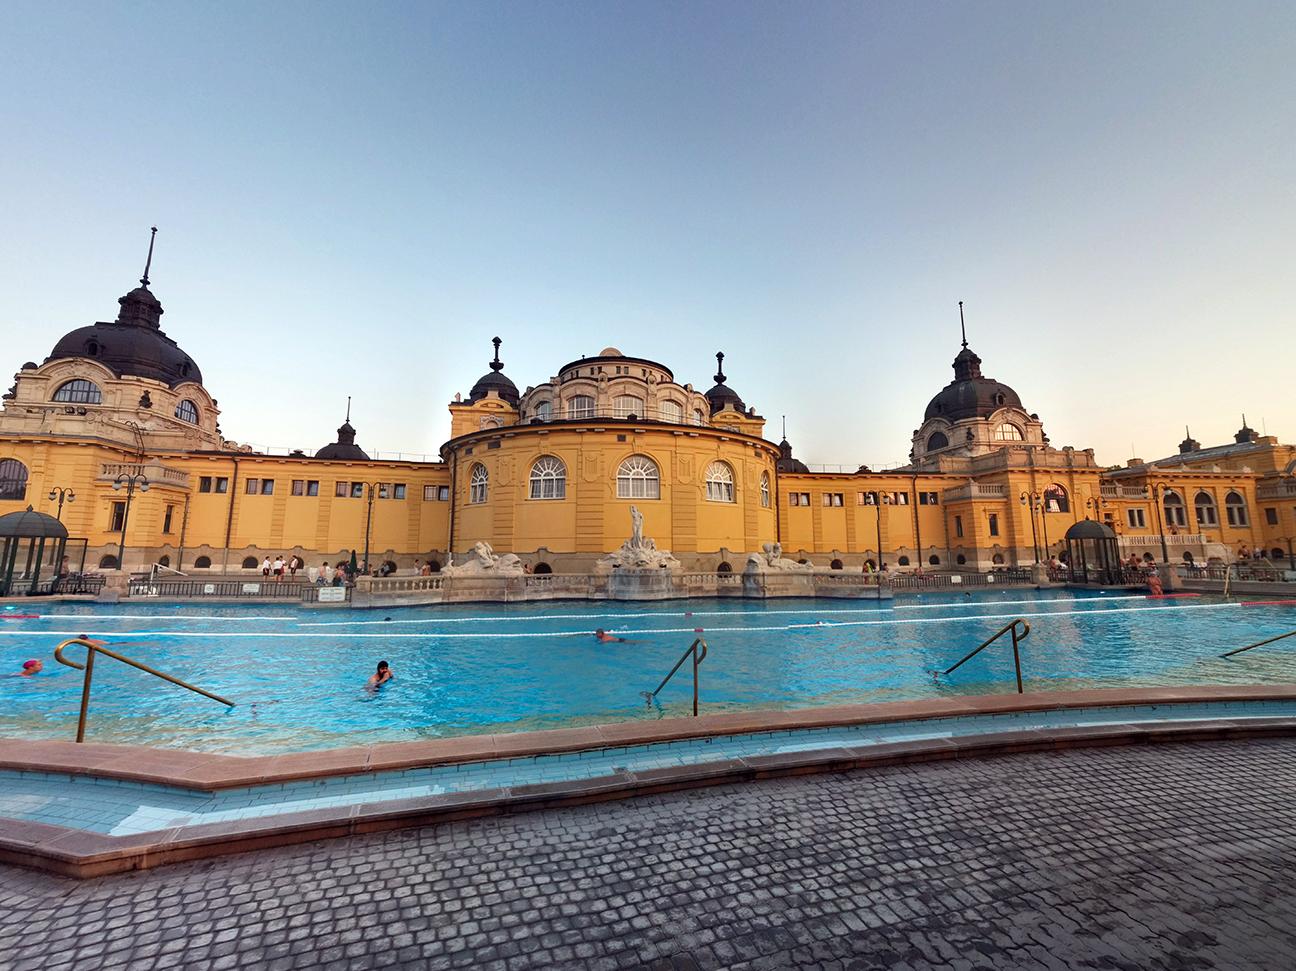 Piscina para nadar en el Szechenyi de Budapest